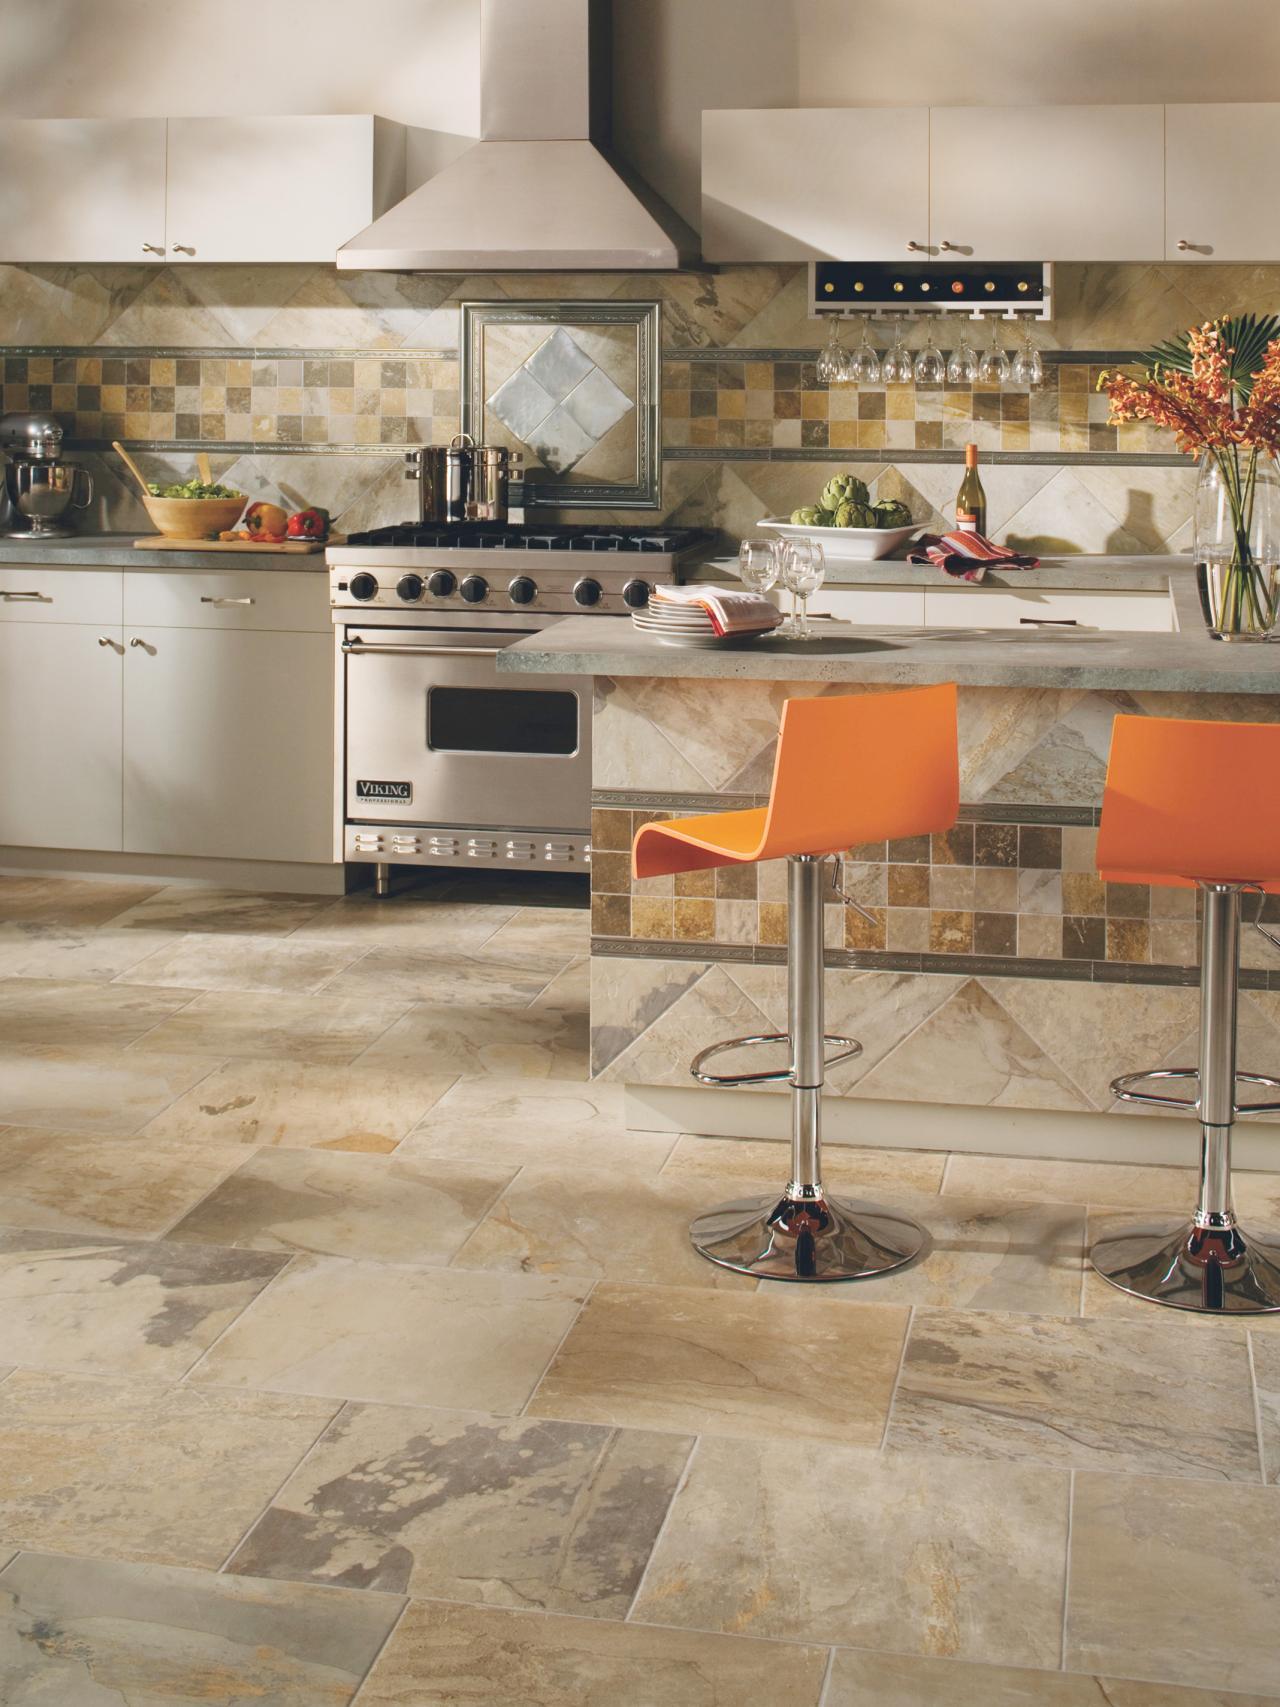 The Pros Cons Of Ceramic Flooring For